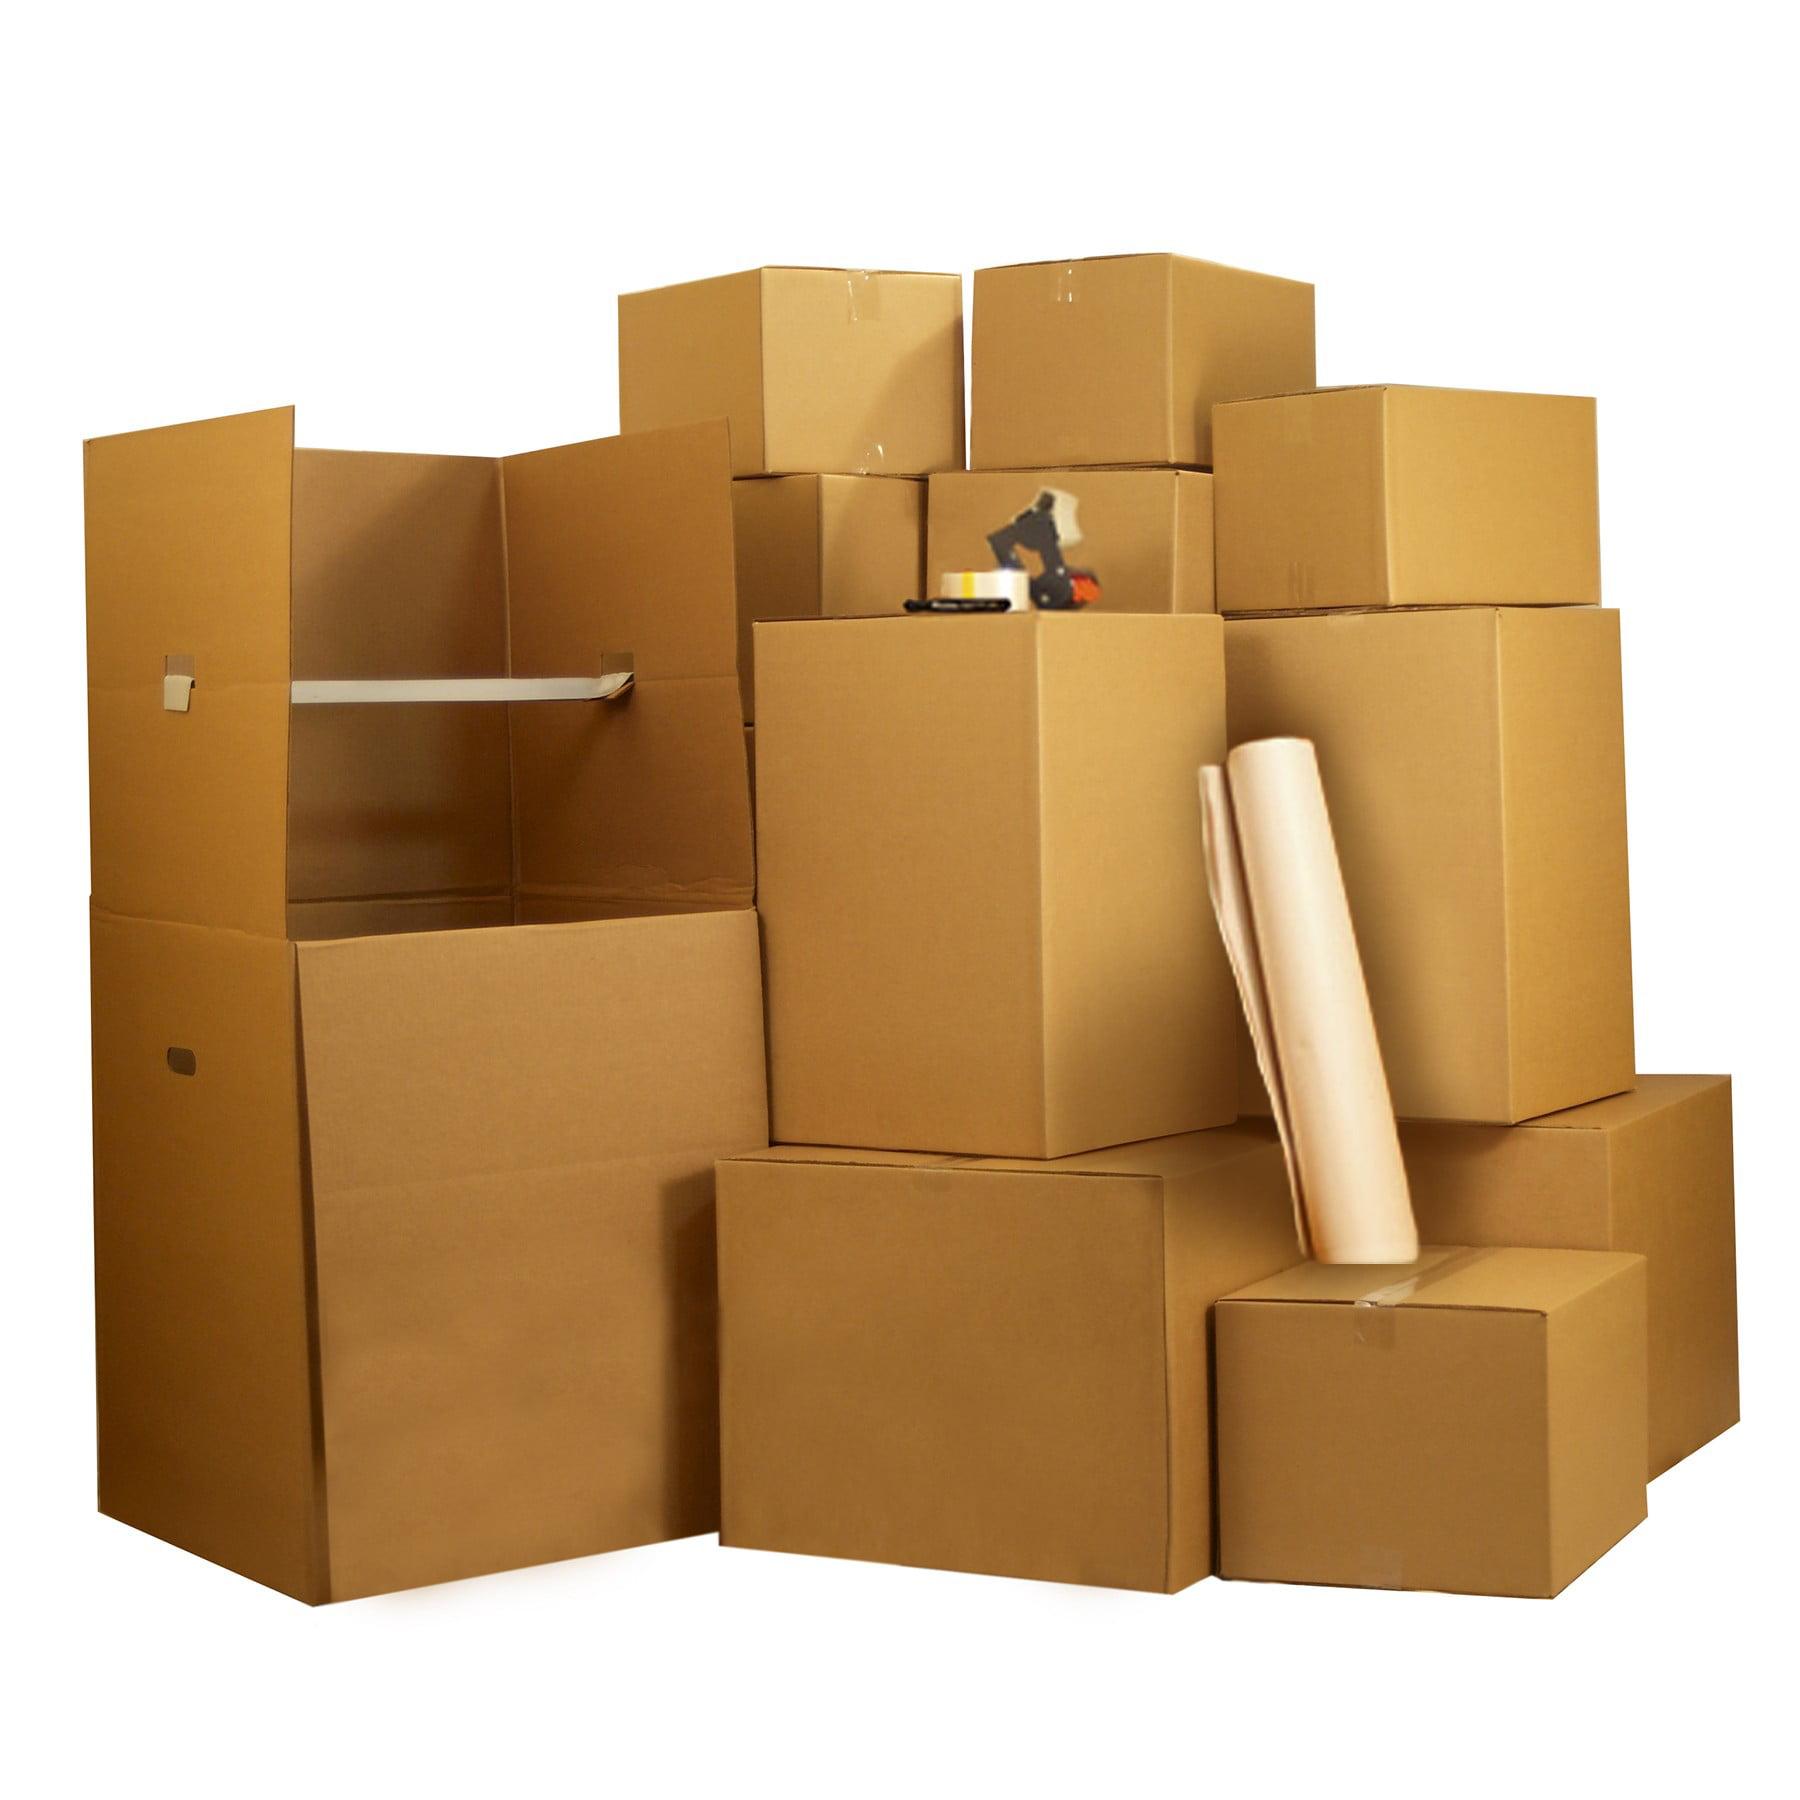 Uboxes 2 Room Wardrobe Moving Kit, 18 Boxes & 2 Wardrobe Box